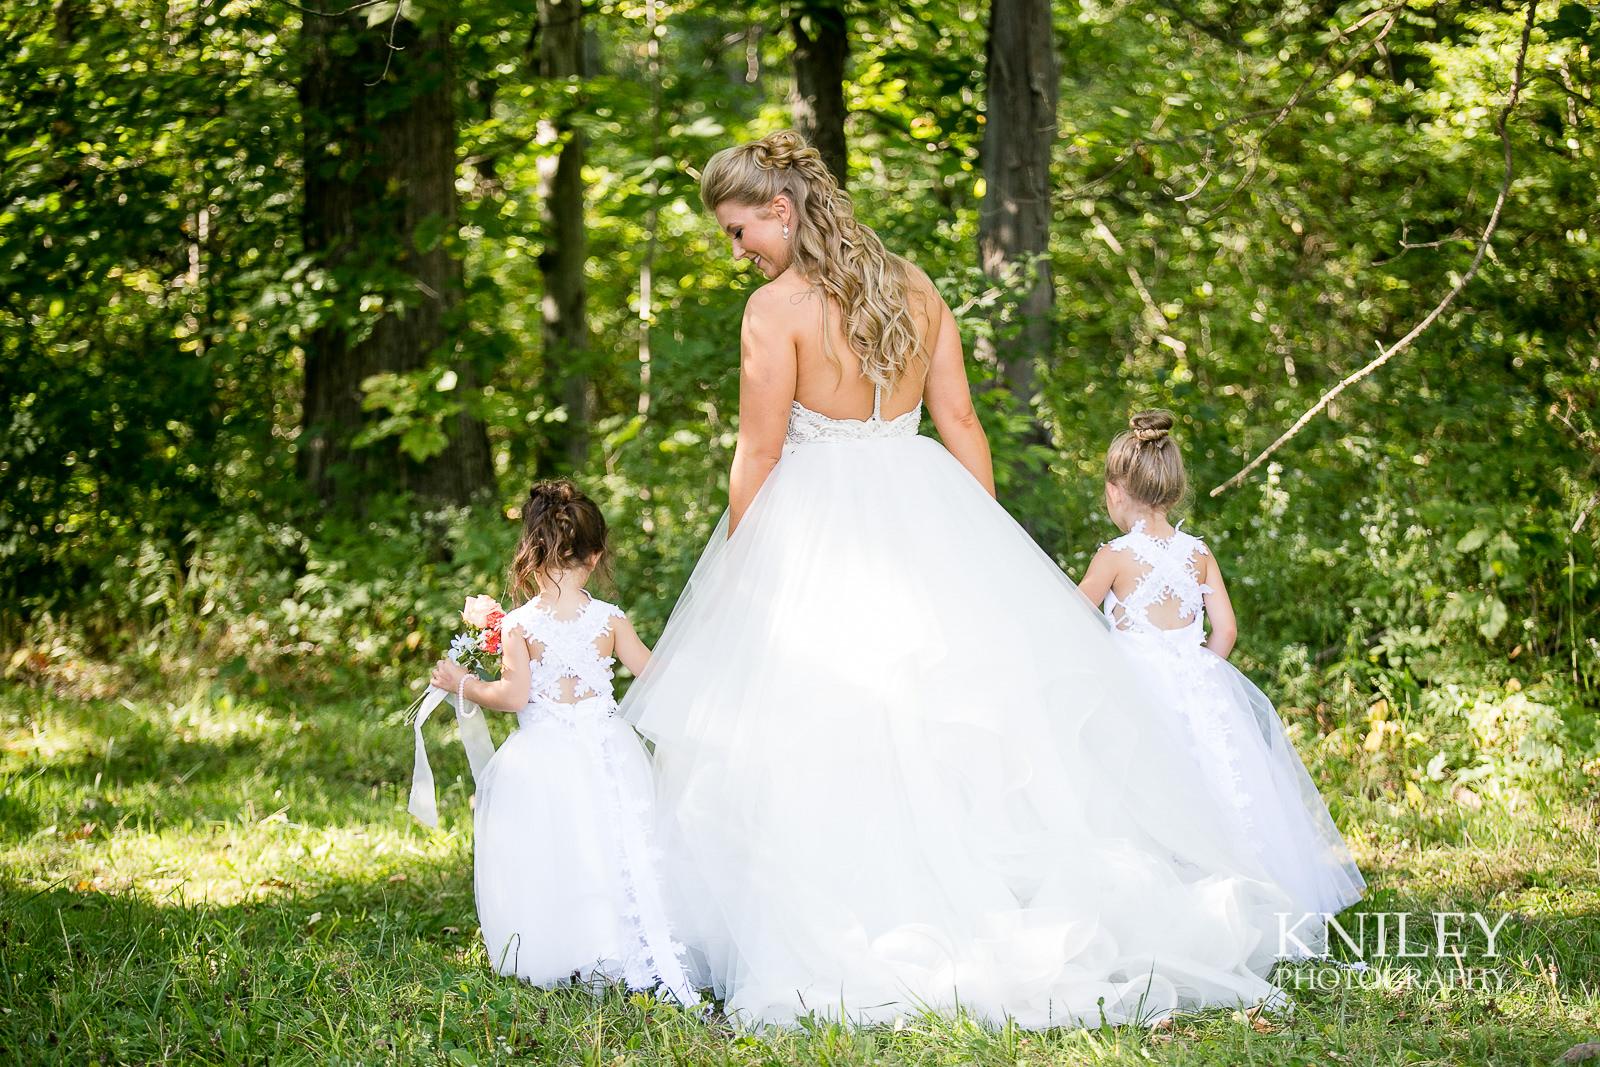 066 - Buffalo NY wedding pictures - IMG_8161.jpg